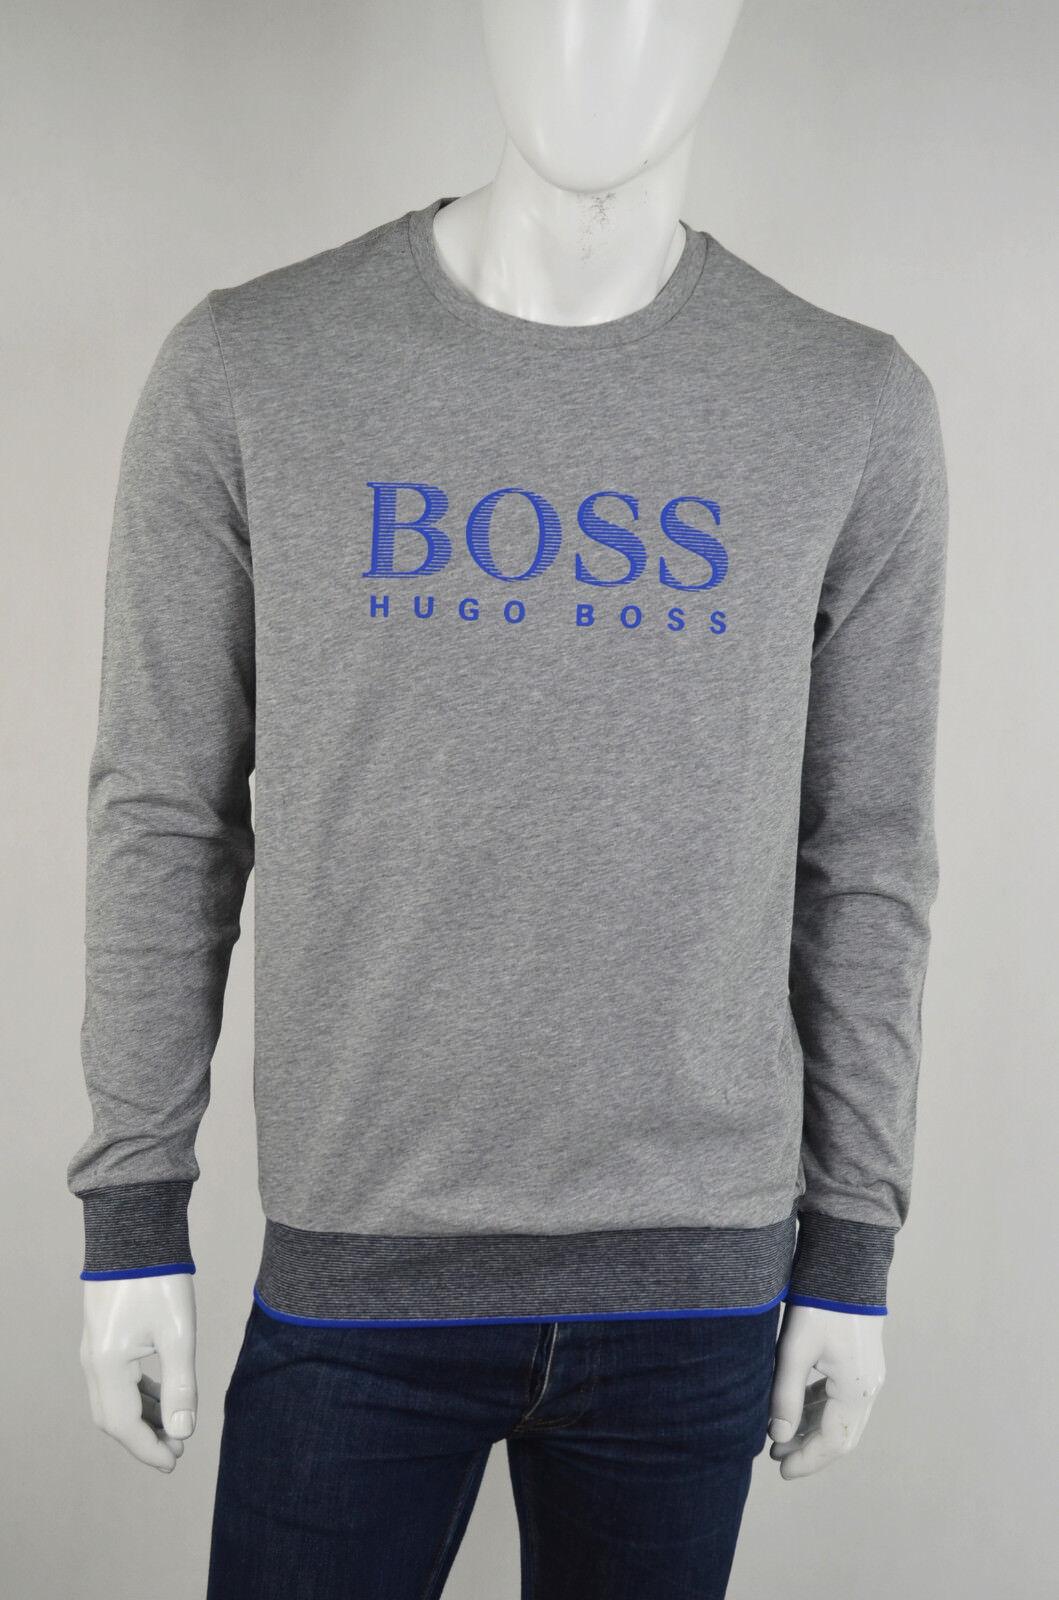 HUGO BOSS AUTH LOGO herren   Sweatshirt SIZE XL